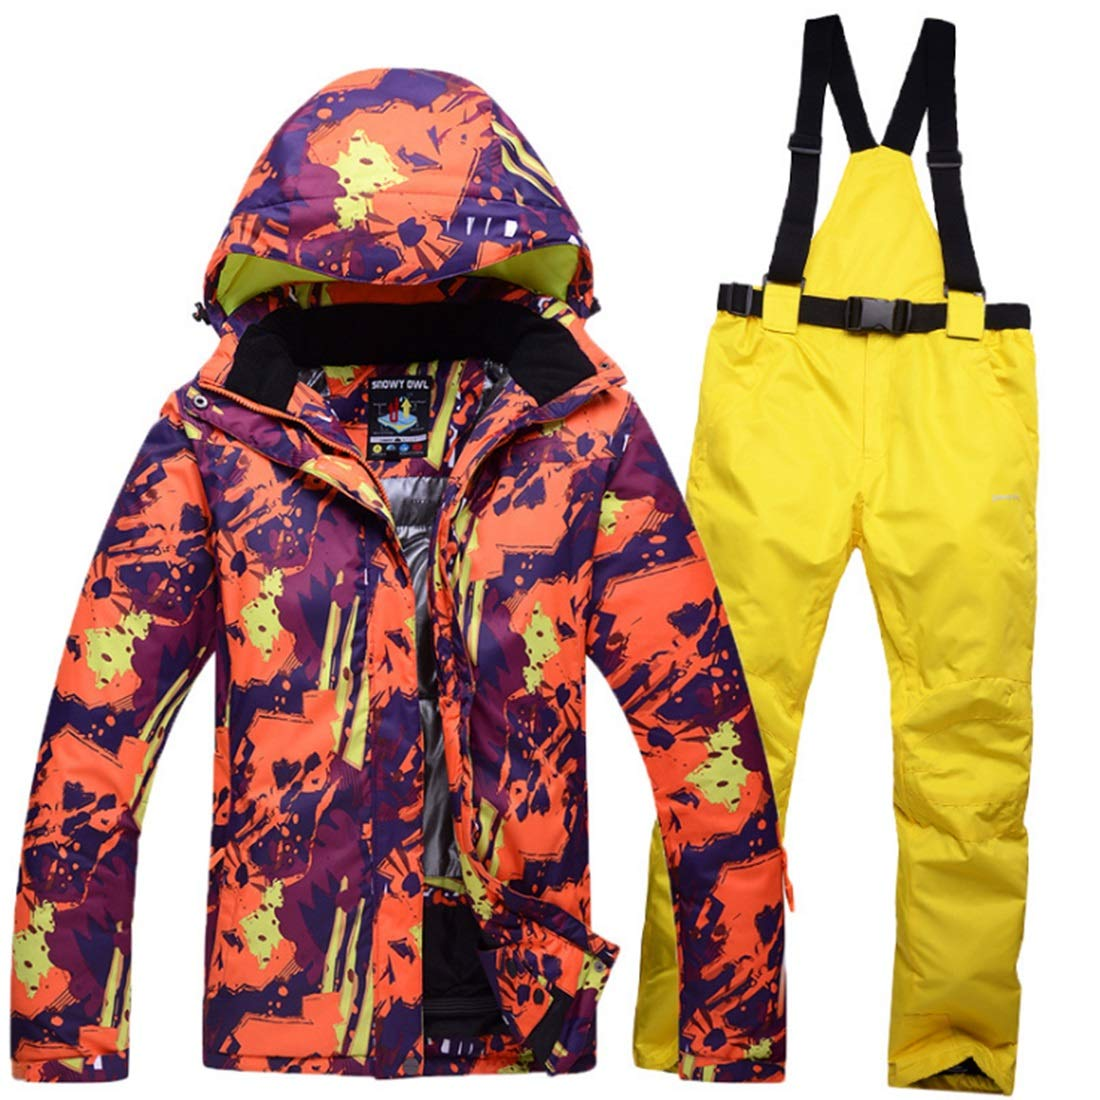 Jhcpca メンズ&レディース防水通気性スノーボードスキージャケット  L